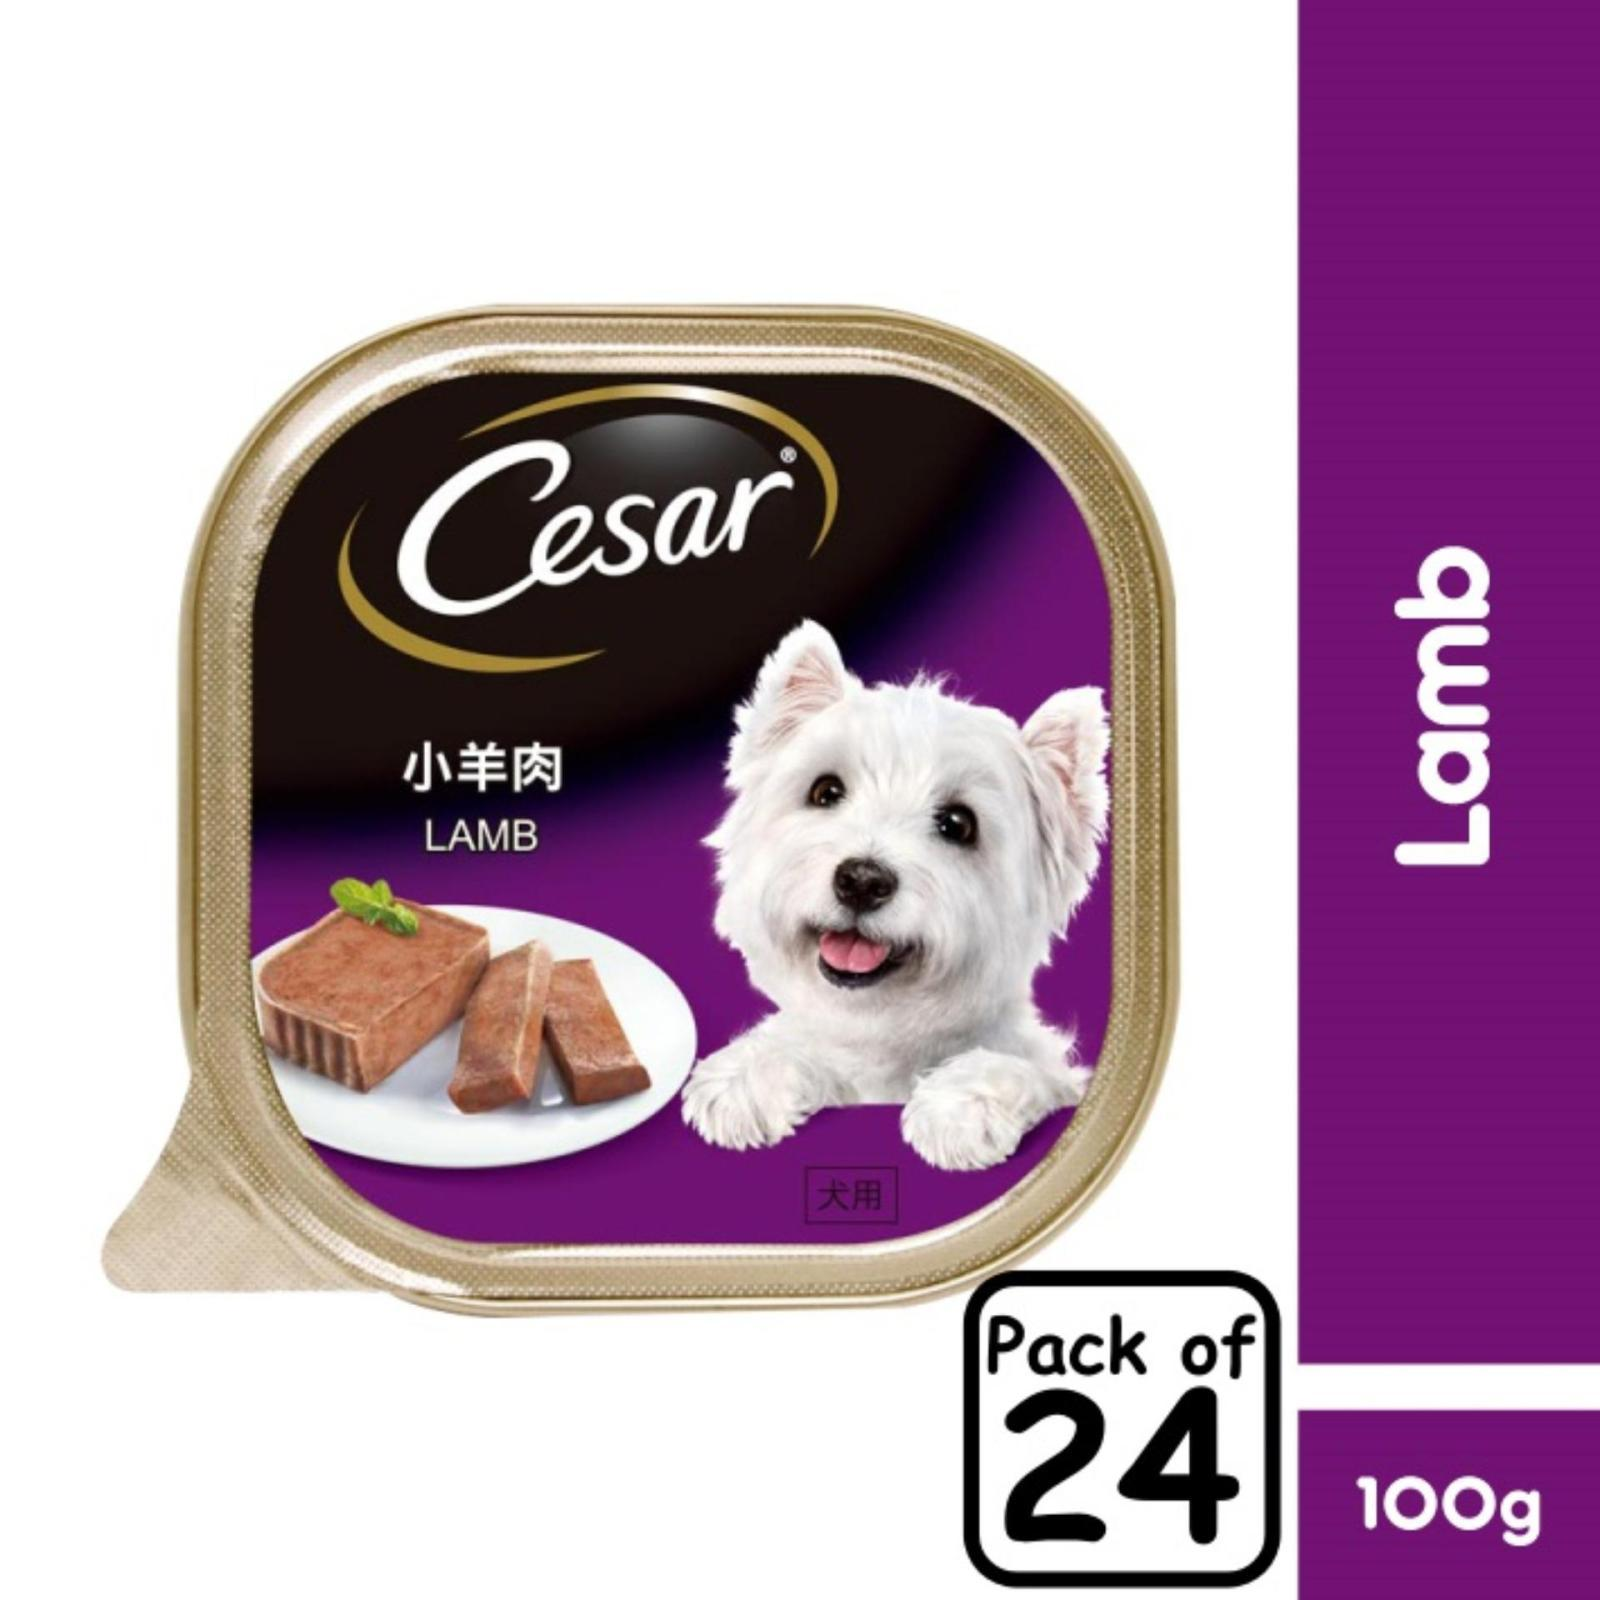 Cesar Lamb Pate Wet Dog Food - Case